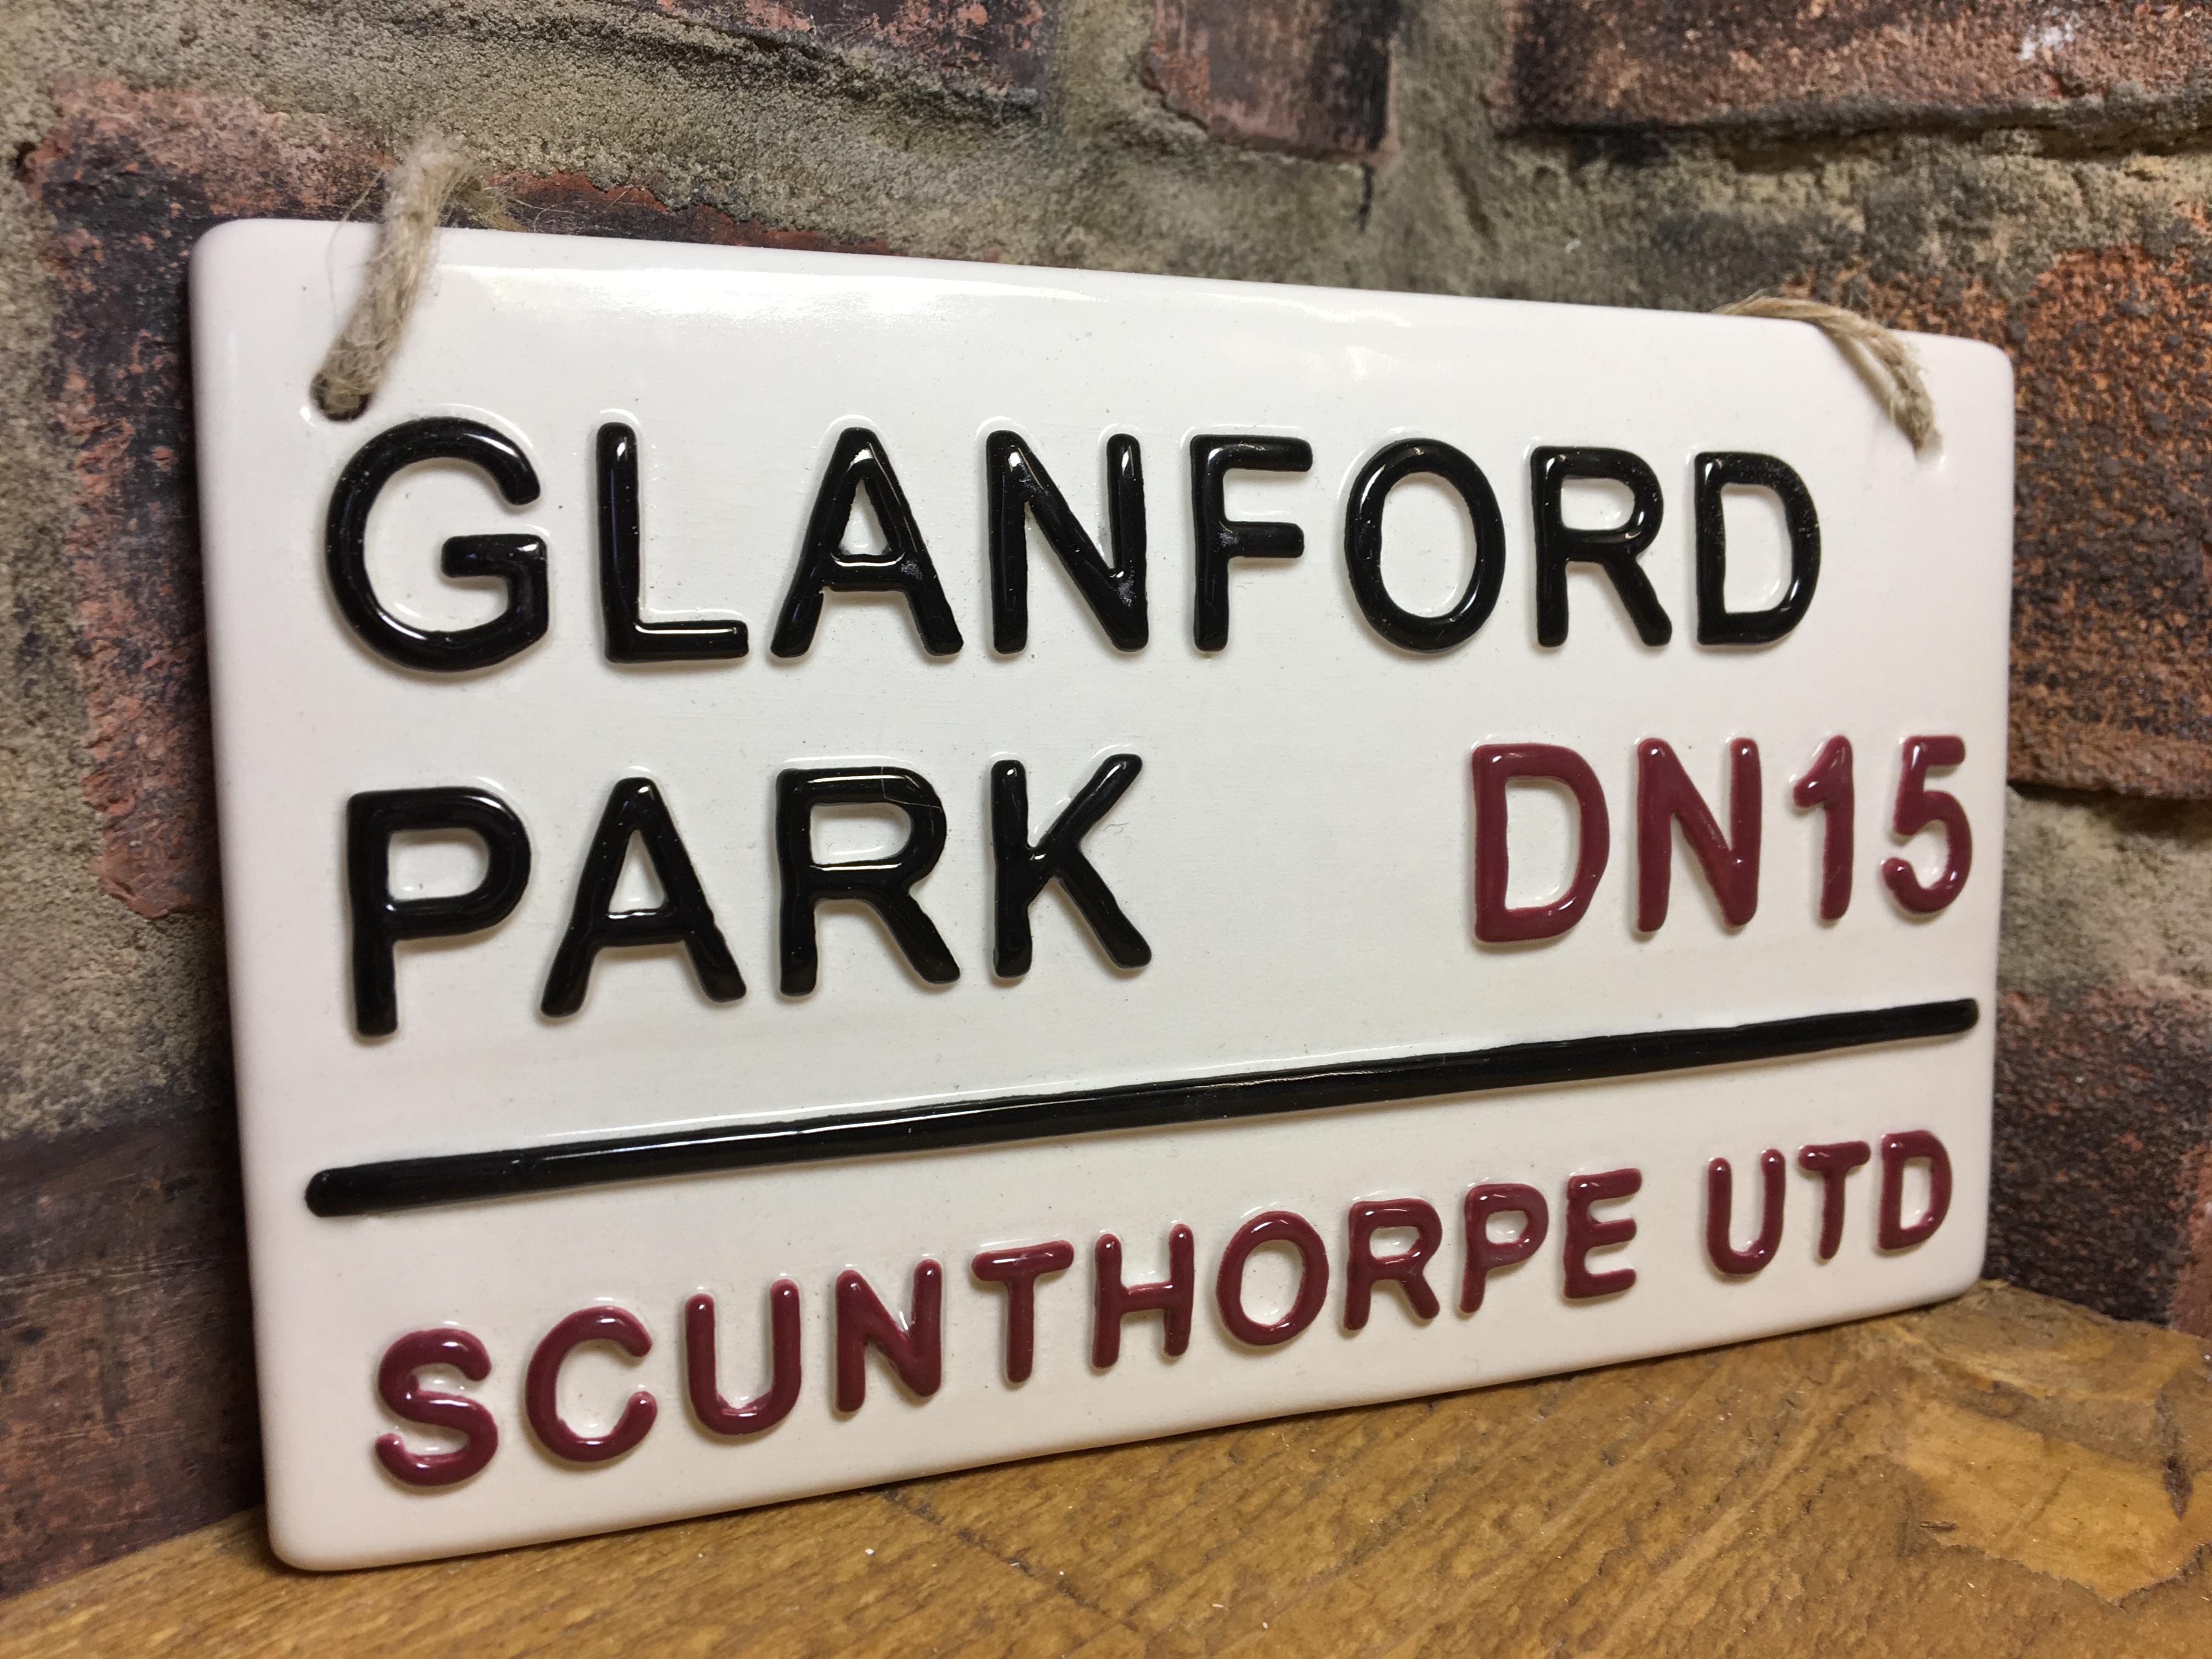 Thumbnail: SCUNTHORPE UTD-Glanford Park